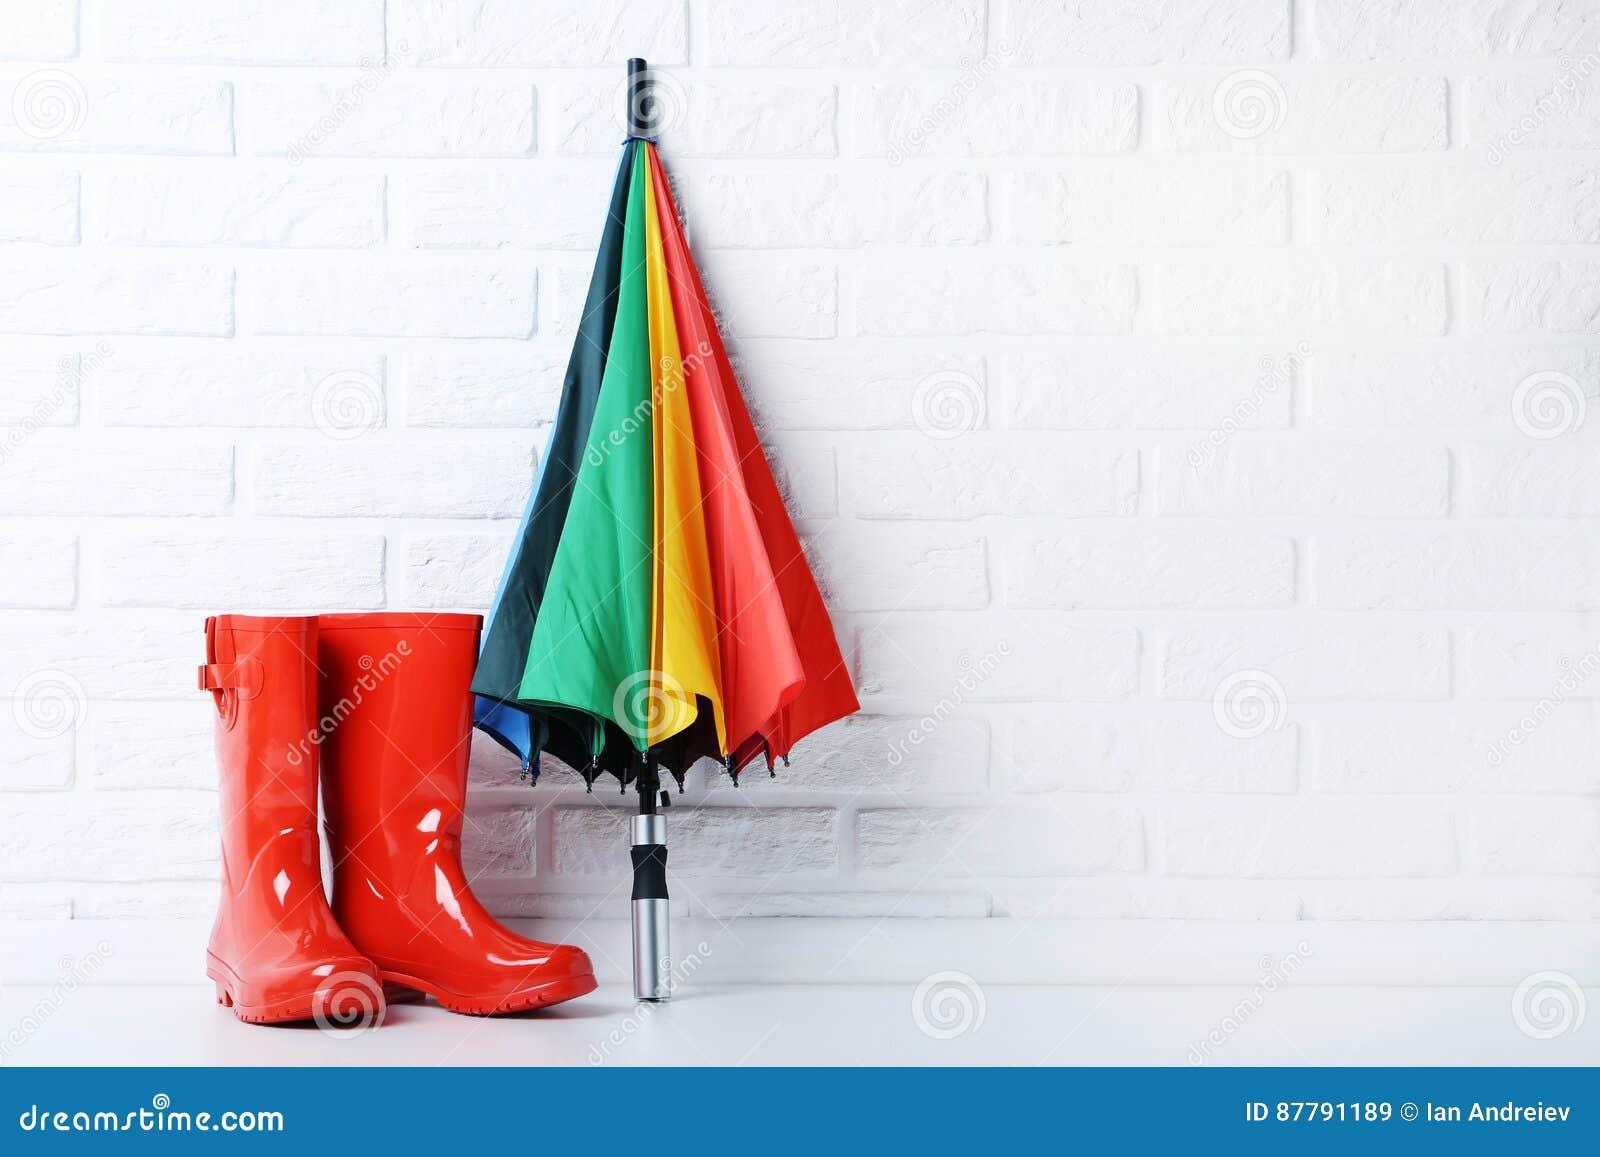 Download Rubber boots stock image. Image of waterproof, footwear - 87791189